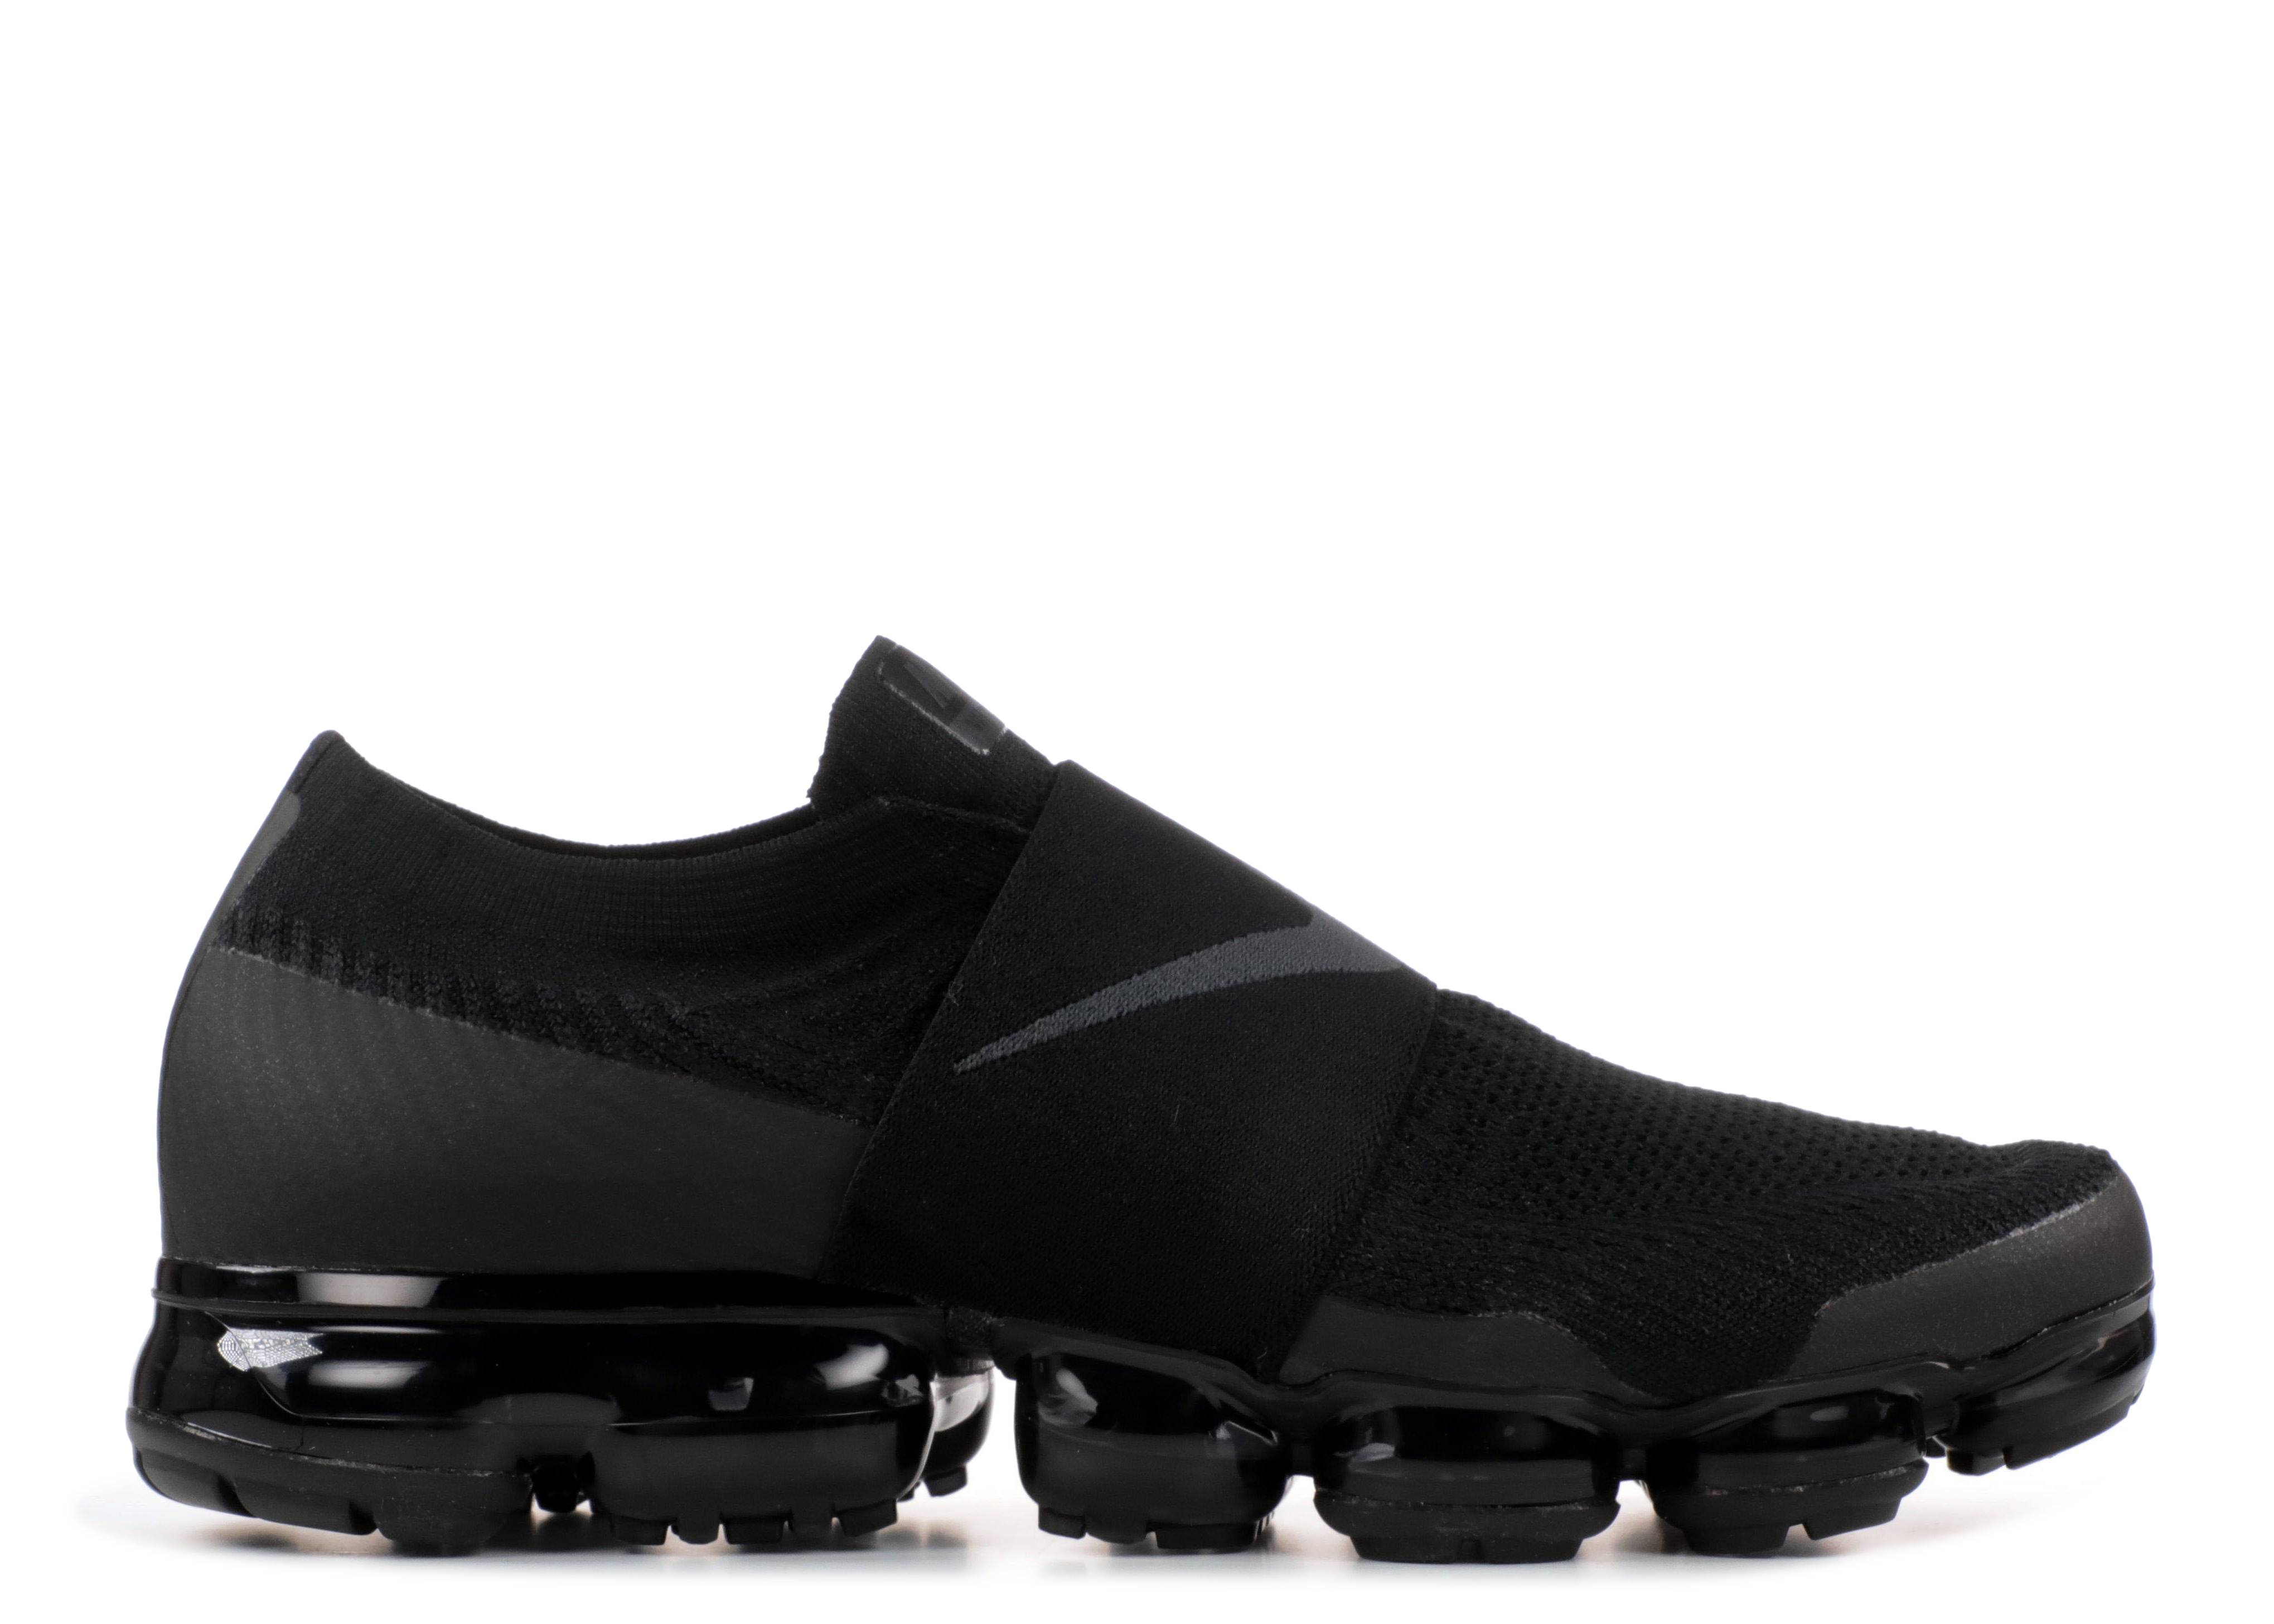 release date: 7612b 5b7af Wmns Nike Air Vapormax Fk Moc - Nike - aa4155 004 - black/anthracite |  Flight Club